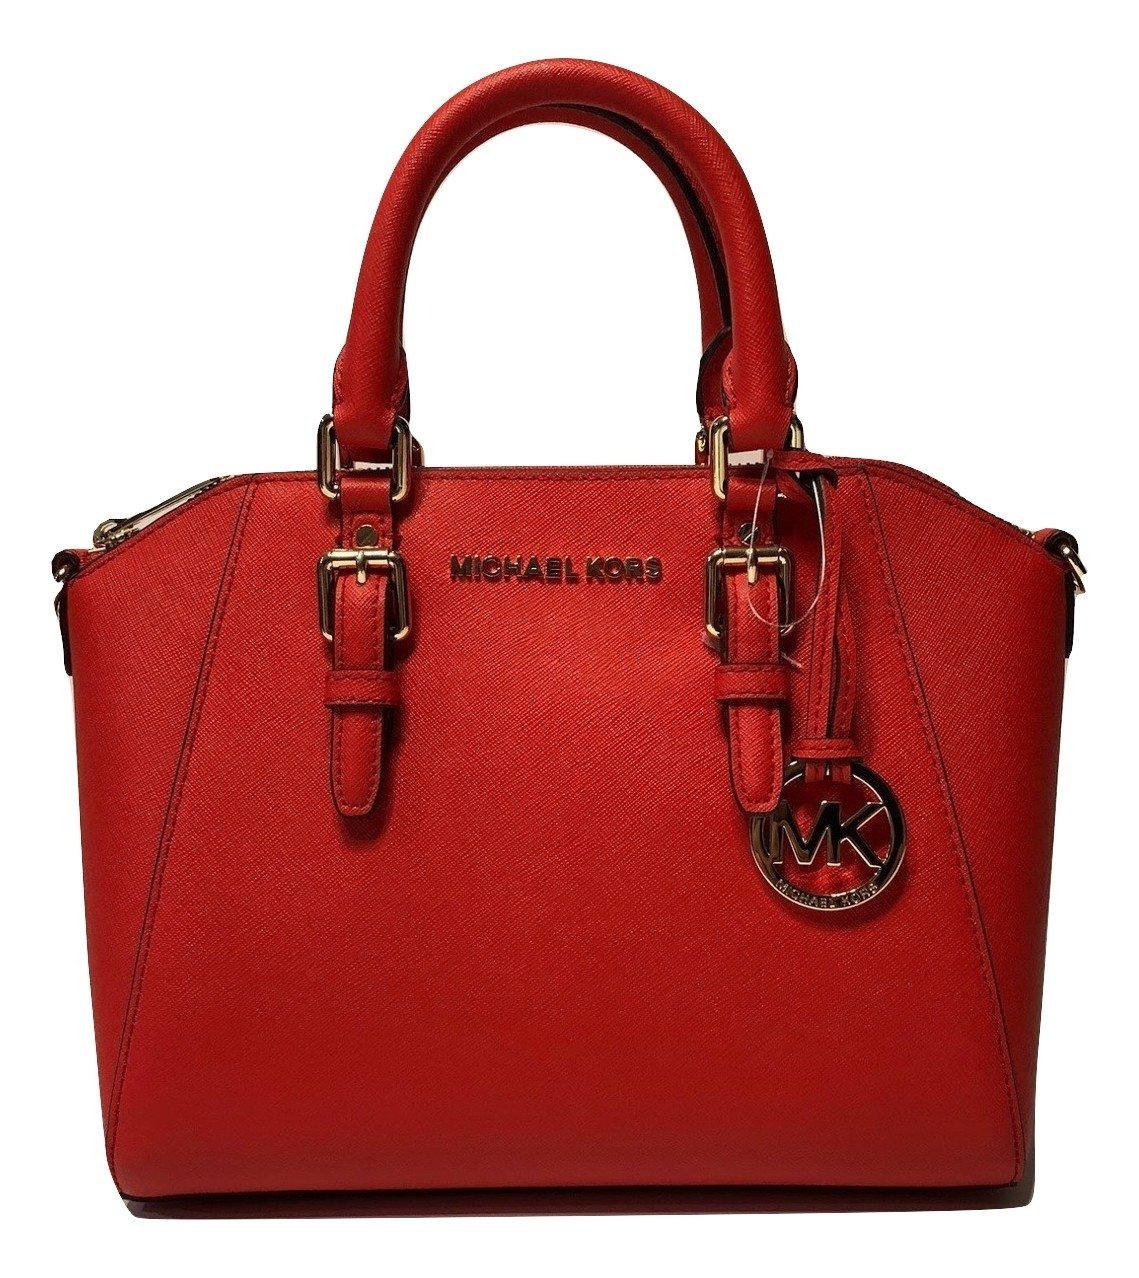 MICHAEL Michael Kors Ciara MD Messenger Handbag (DK Sangria) by Michael Kors